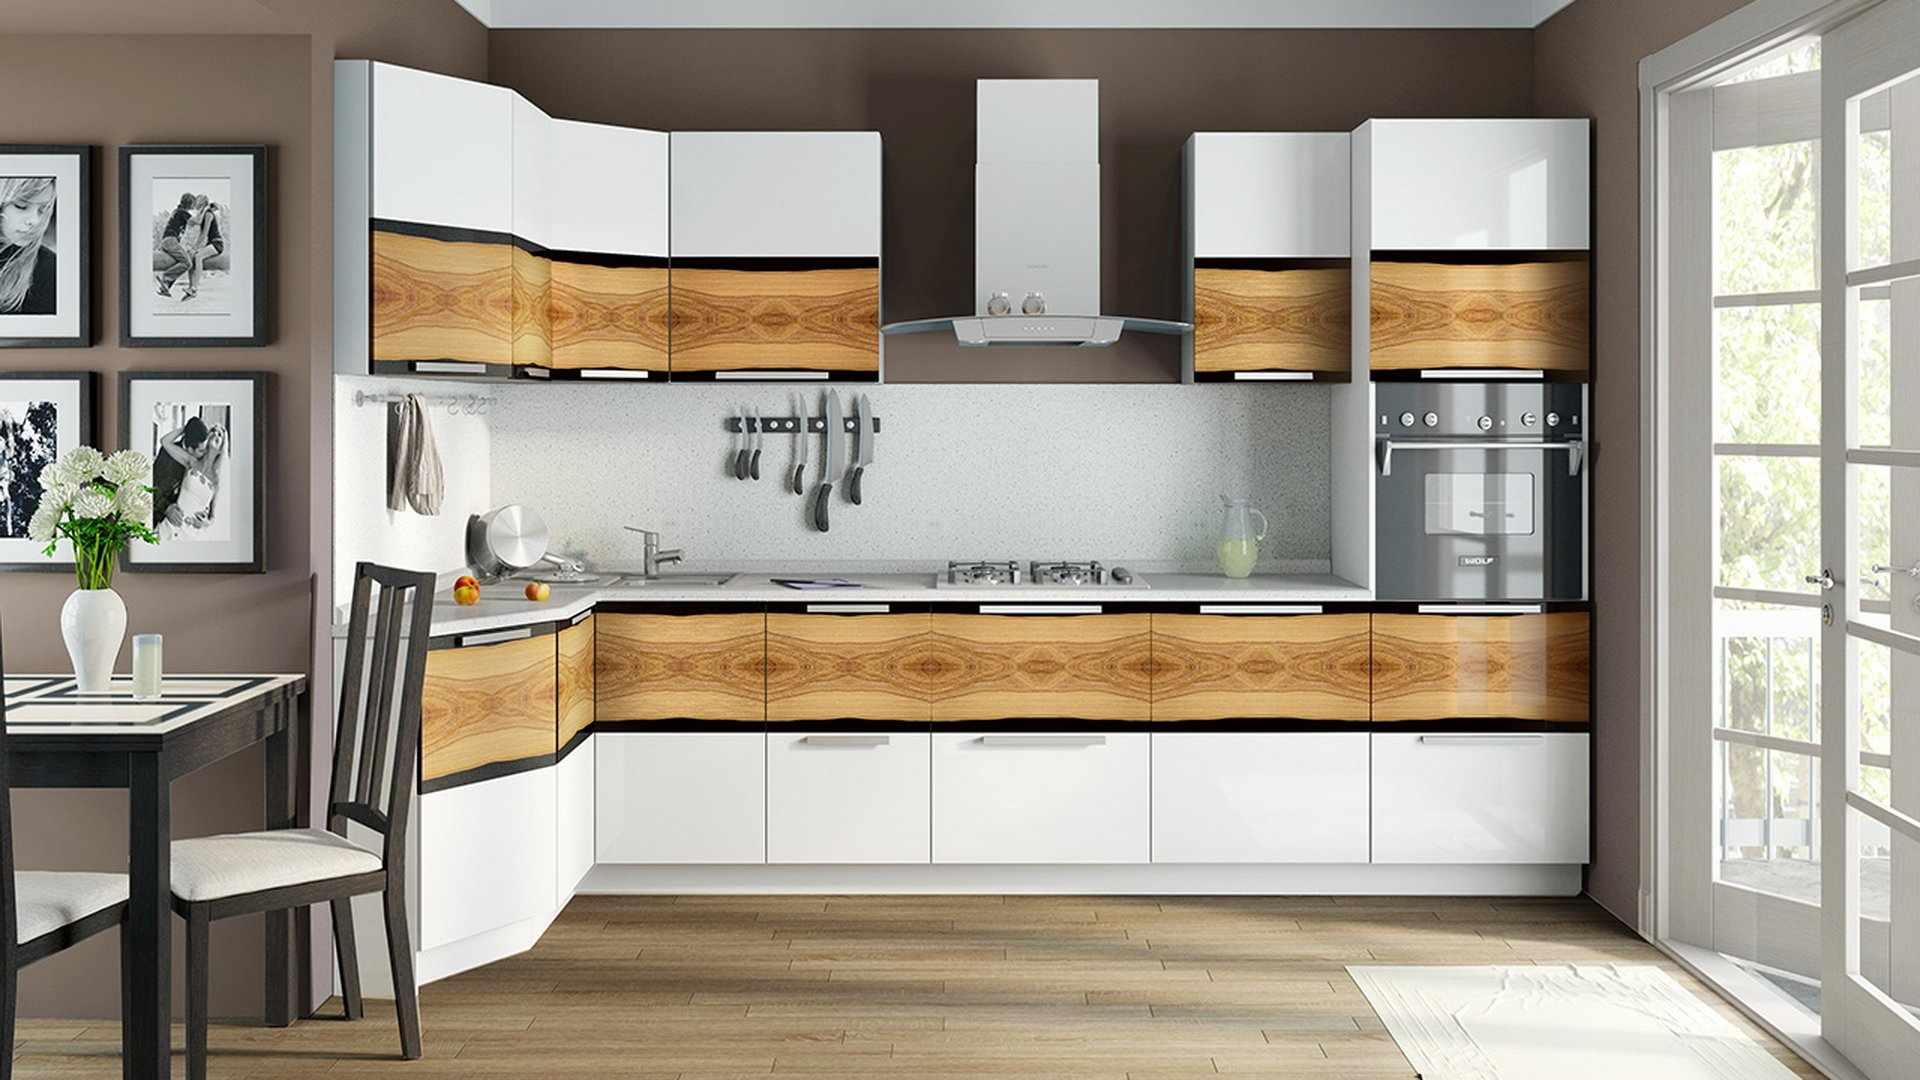 Интерьер с кухонным гарнитуром